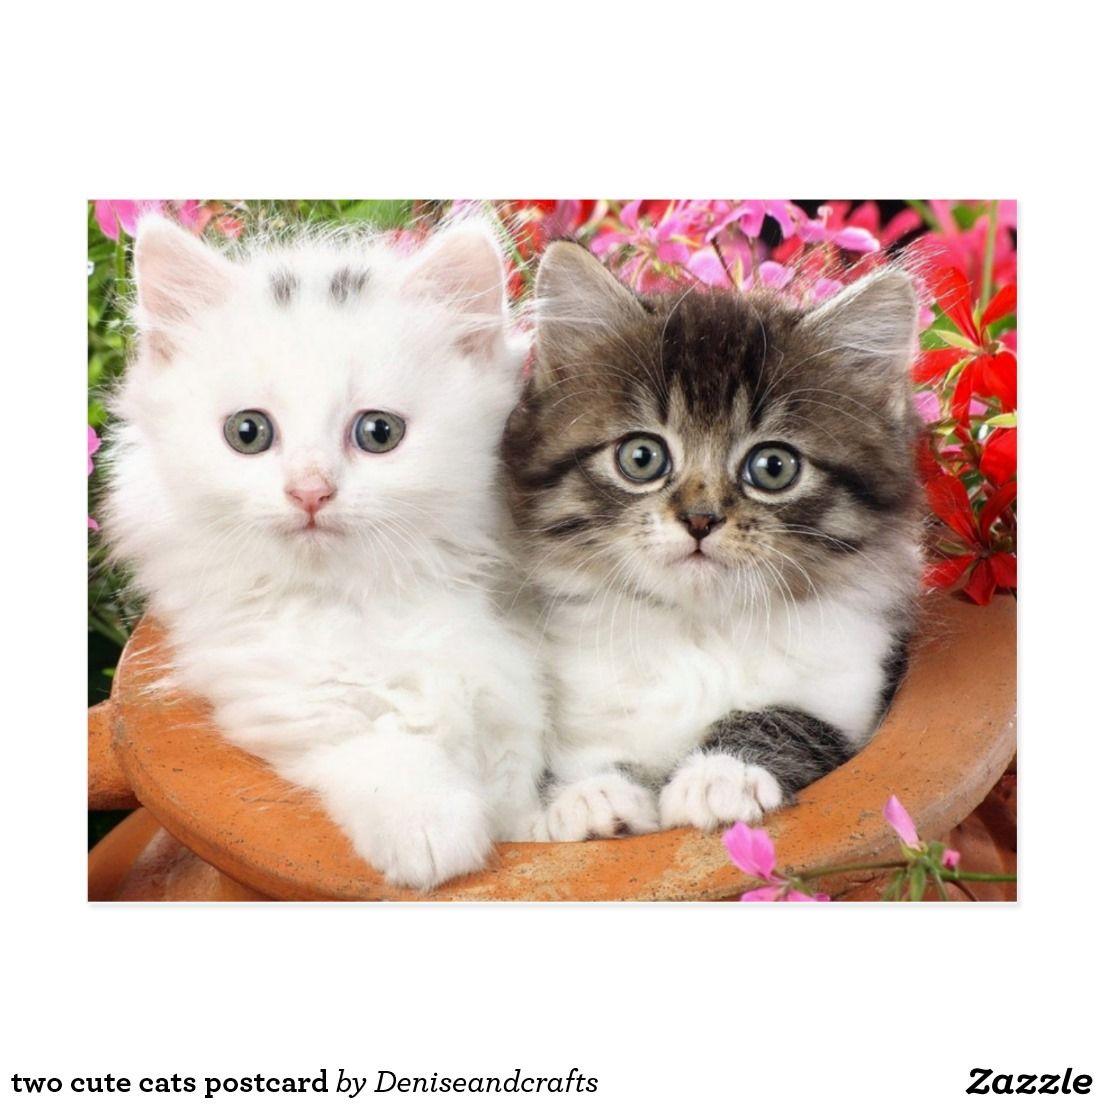 Two Cute Cats Postcard Cute Cat Wallpaper Kitten Wallpaper Beautiful Kittens